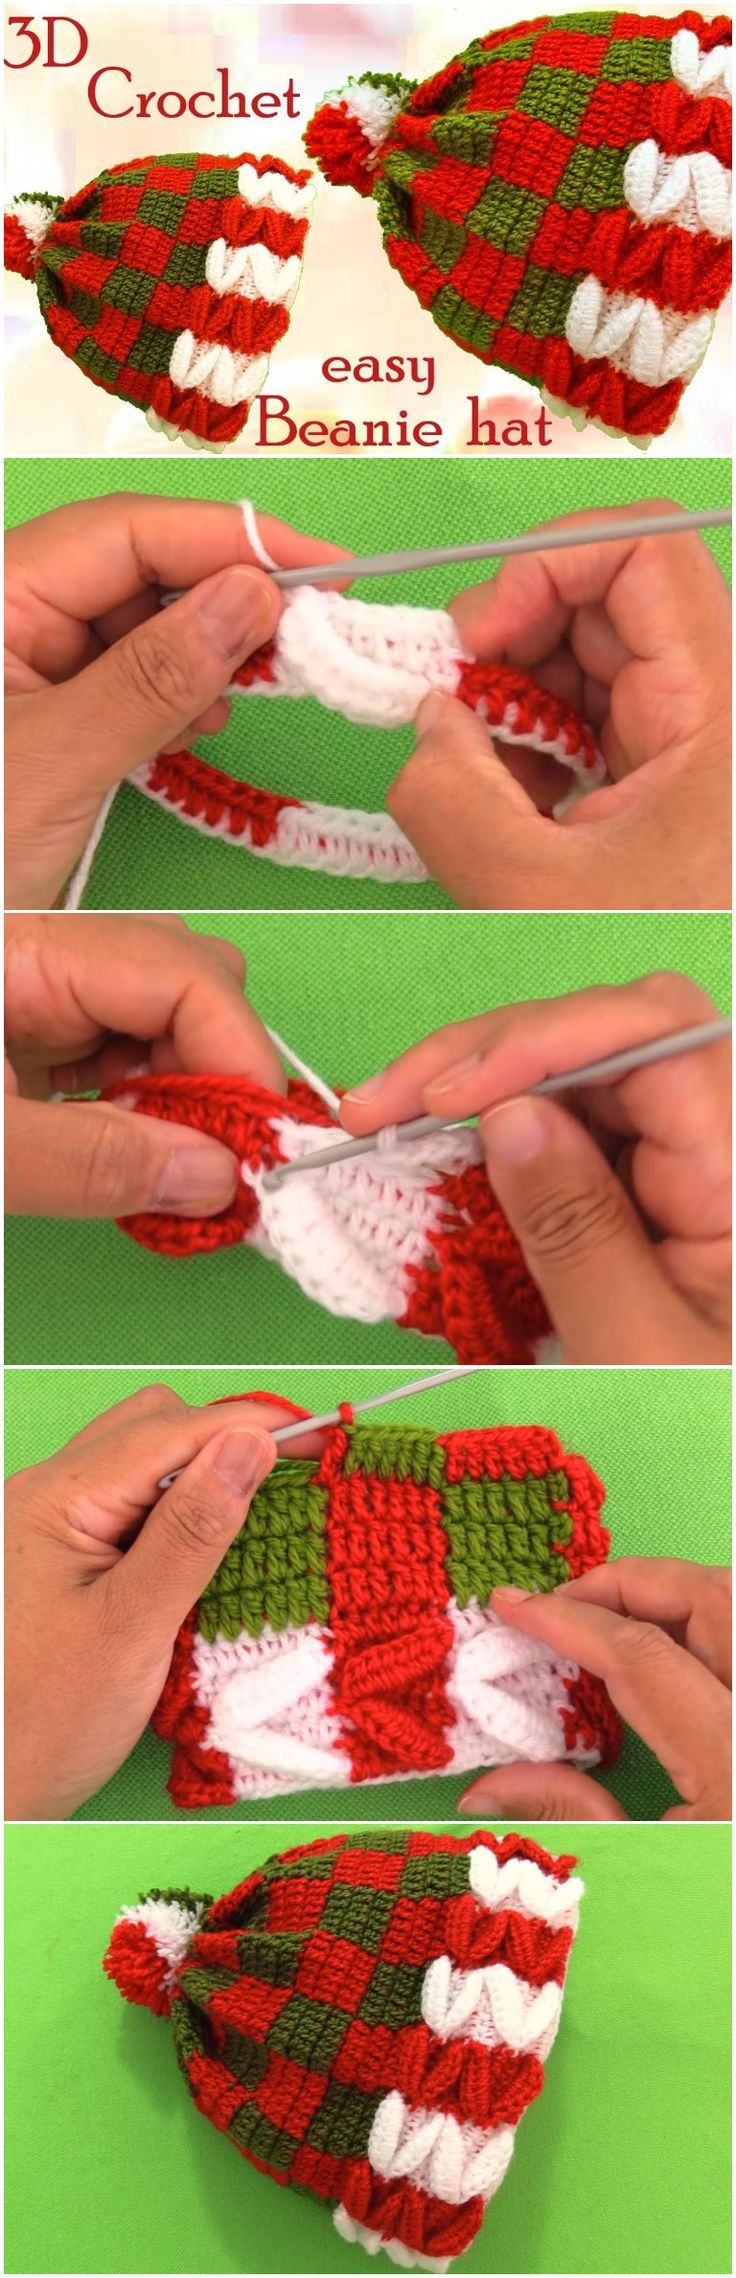 Crochet Christmas 3D Beanie Hat